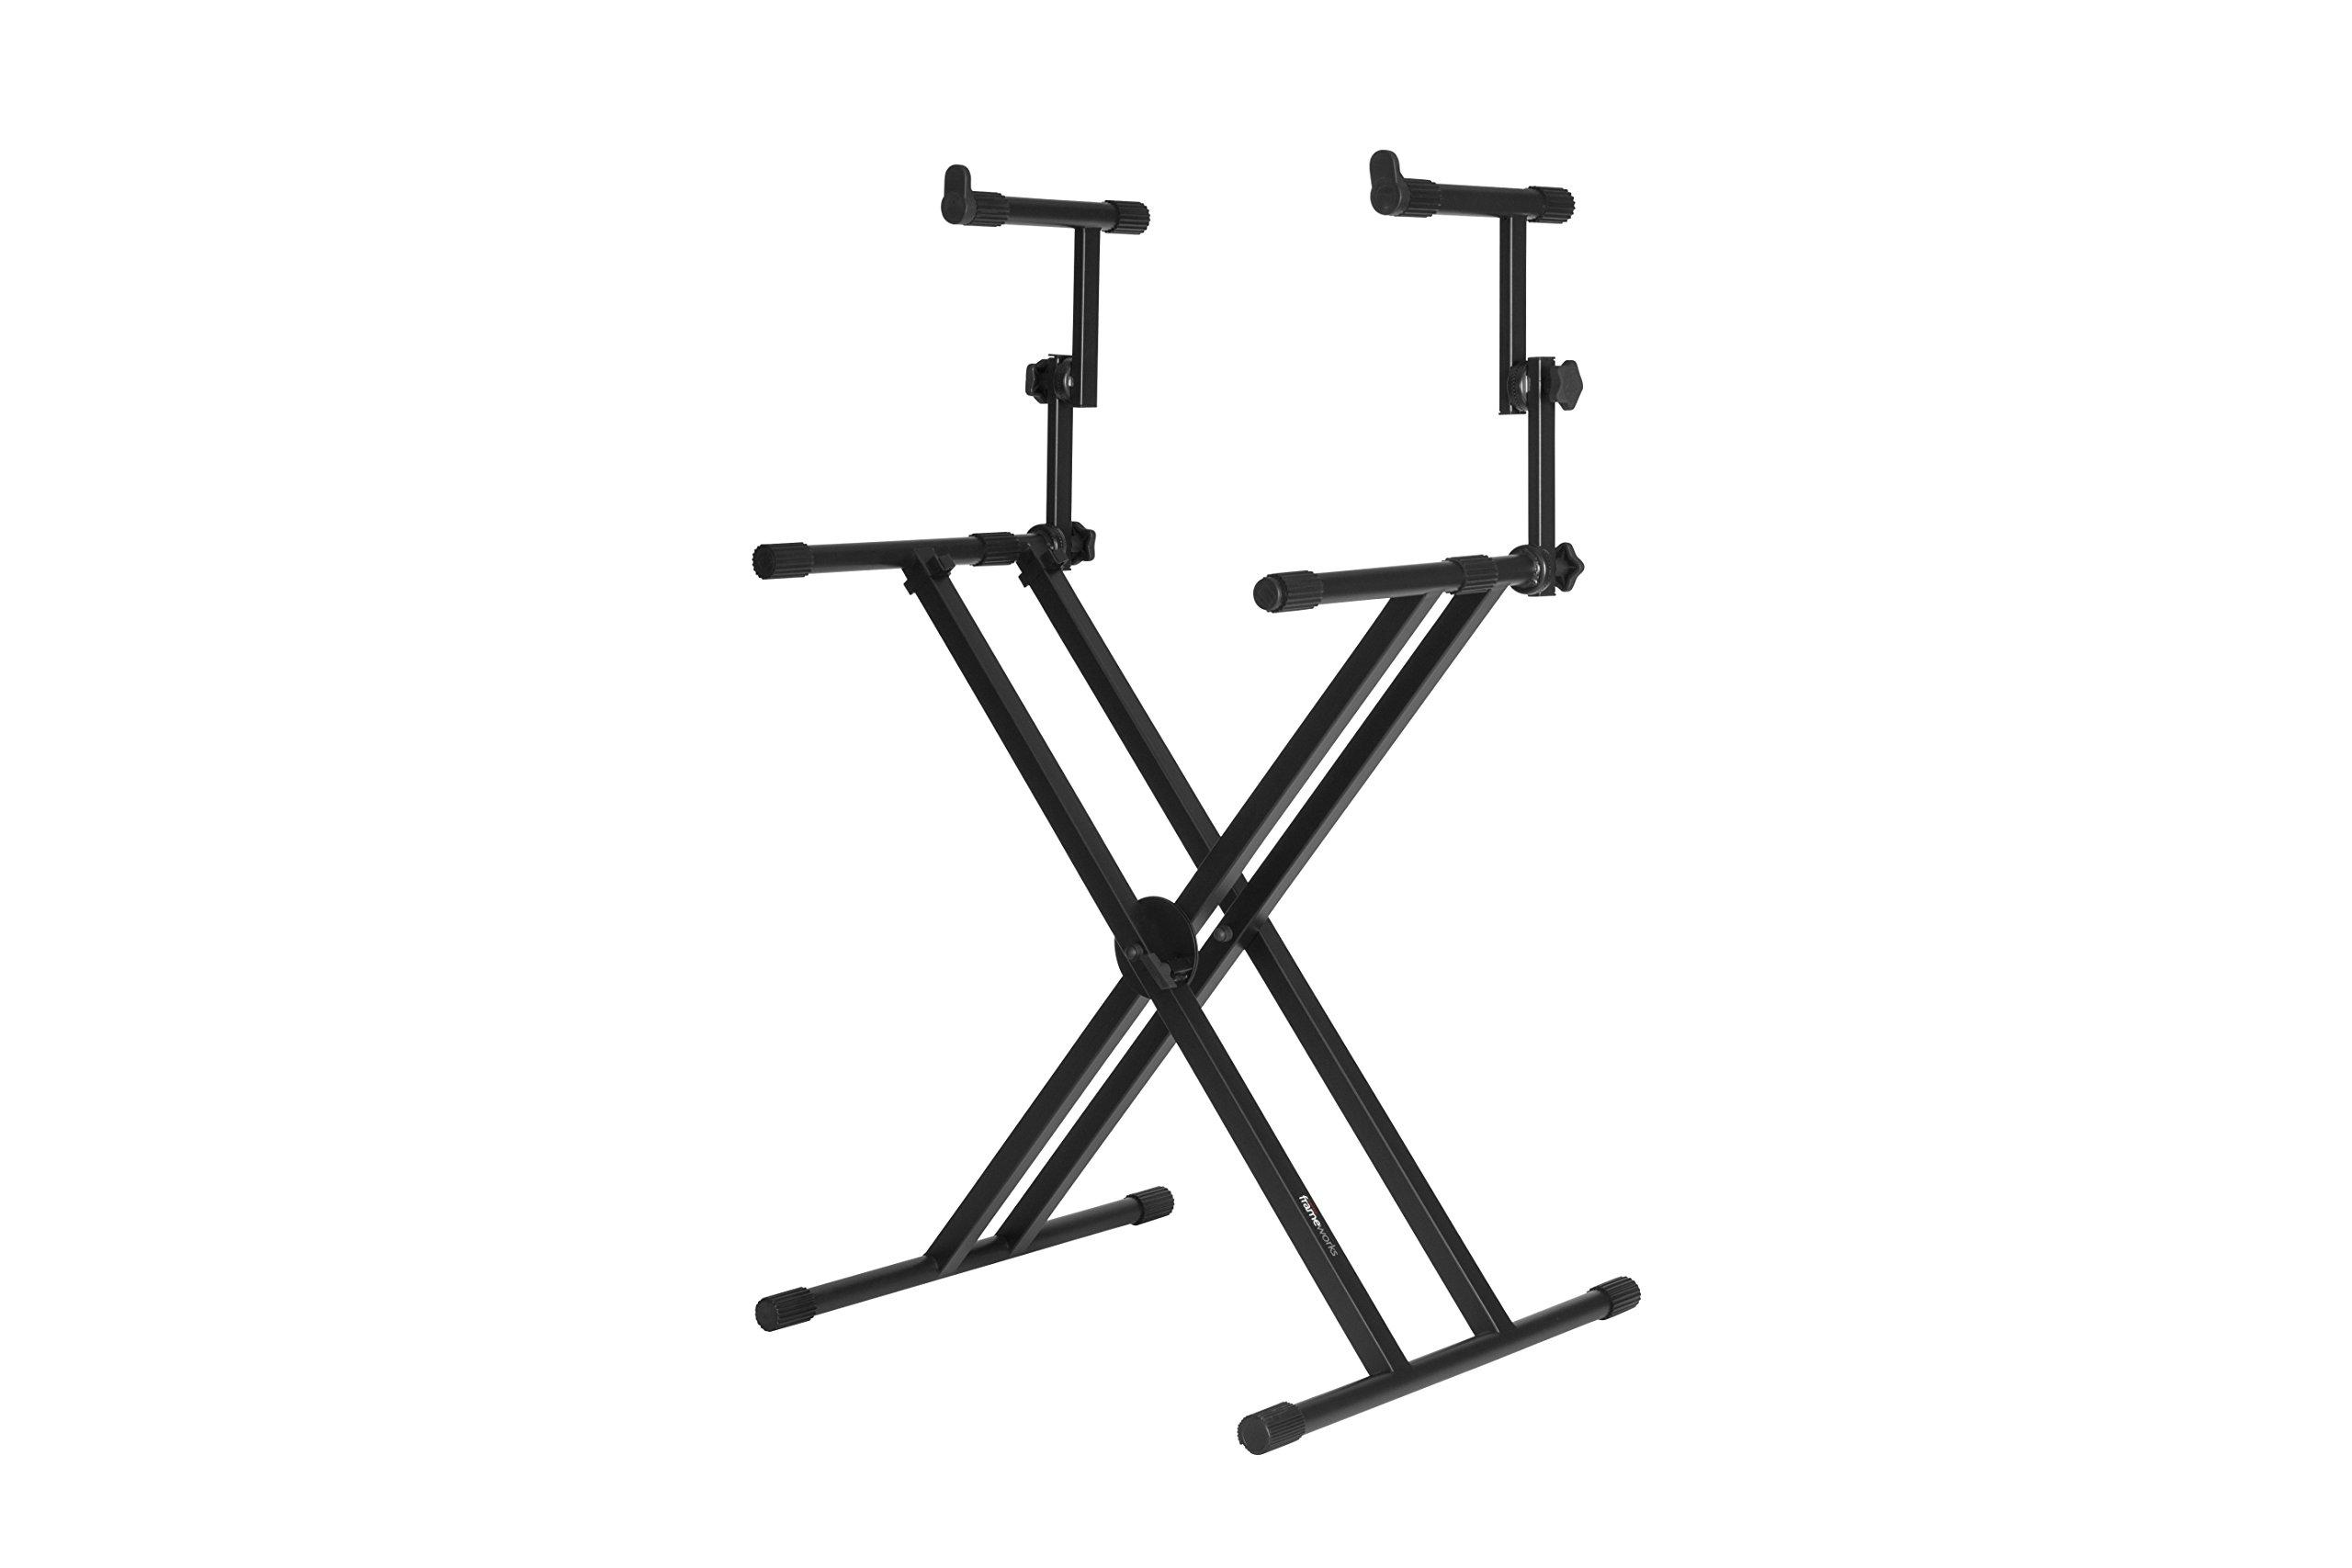 Gator Frameworks GFW-KEY-5100X Deluxe Two Tier X Style Keyboard Stand, Black